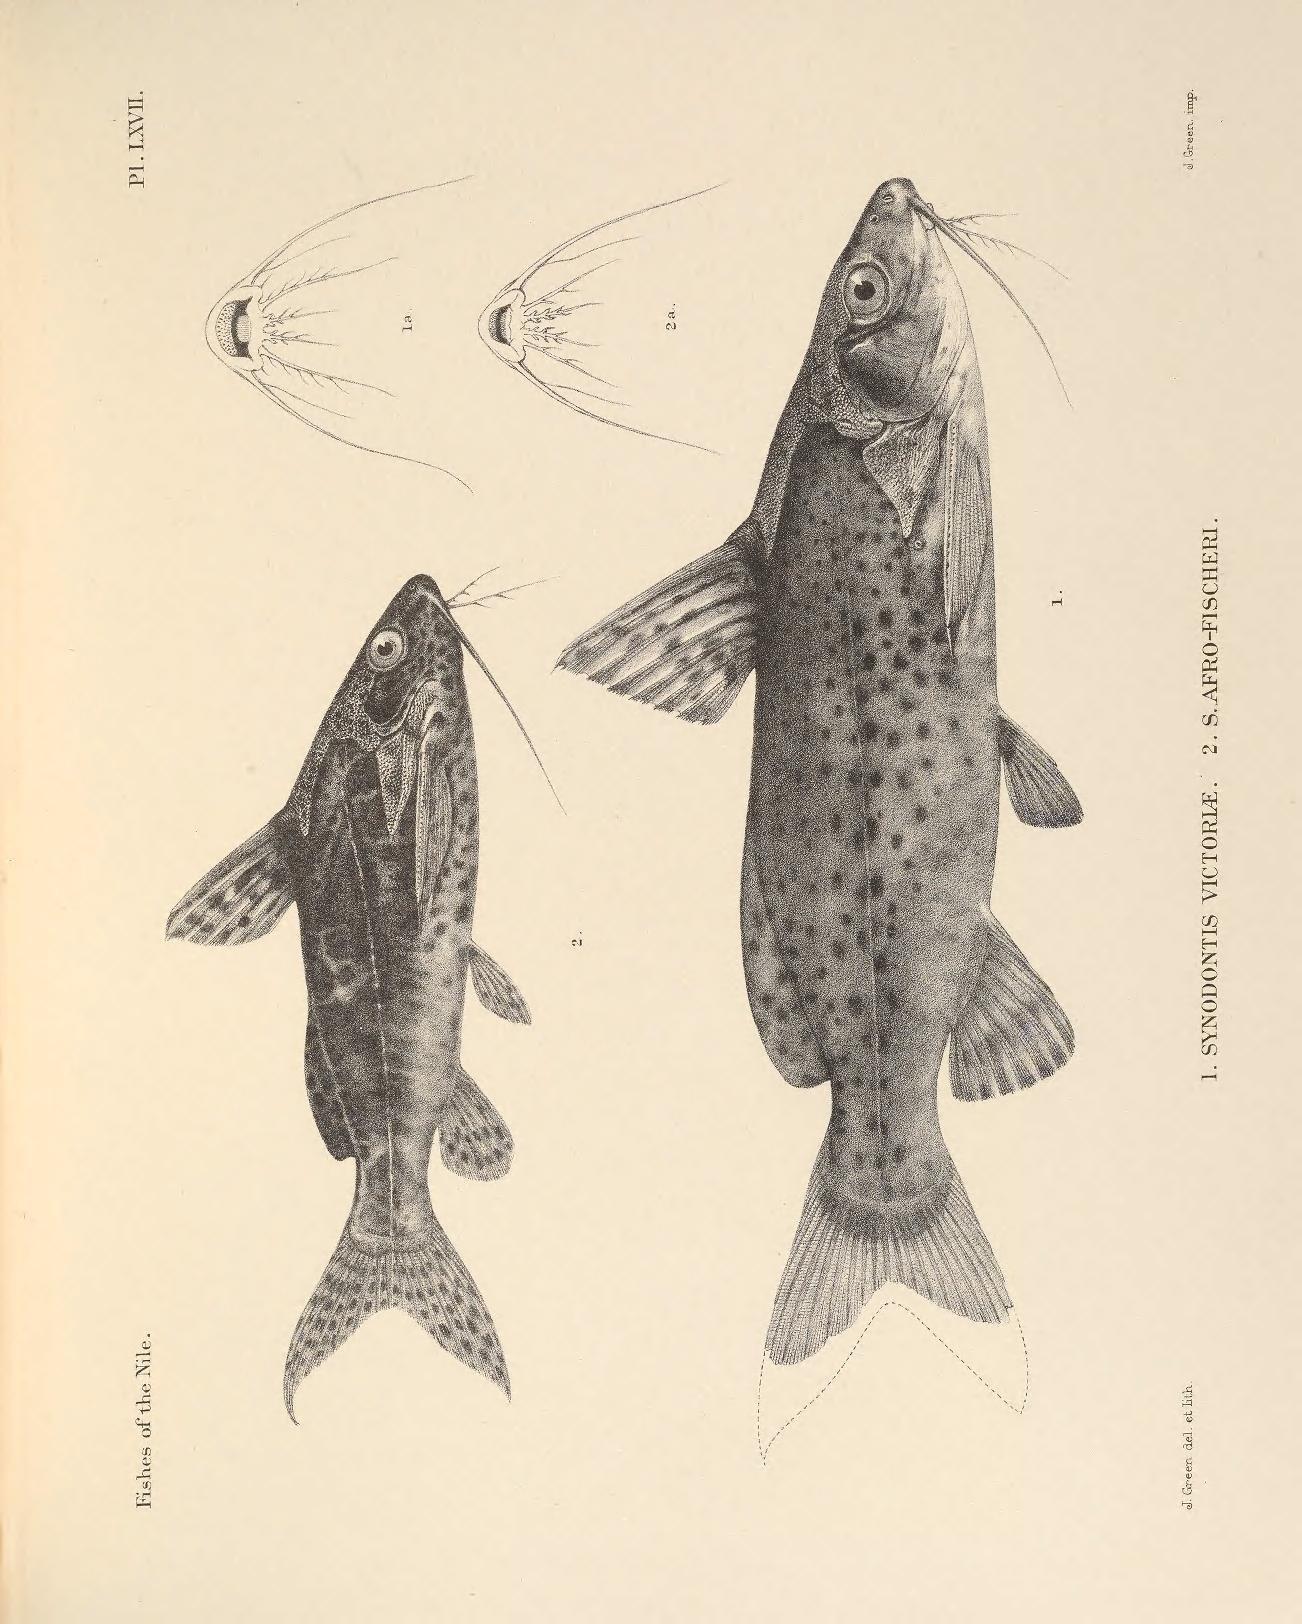 Image of Lake Victoria Squeaker